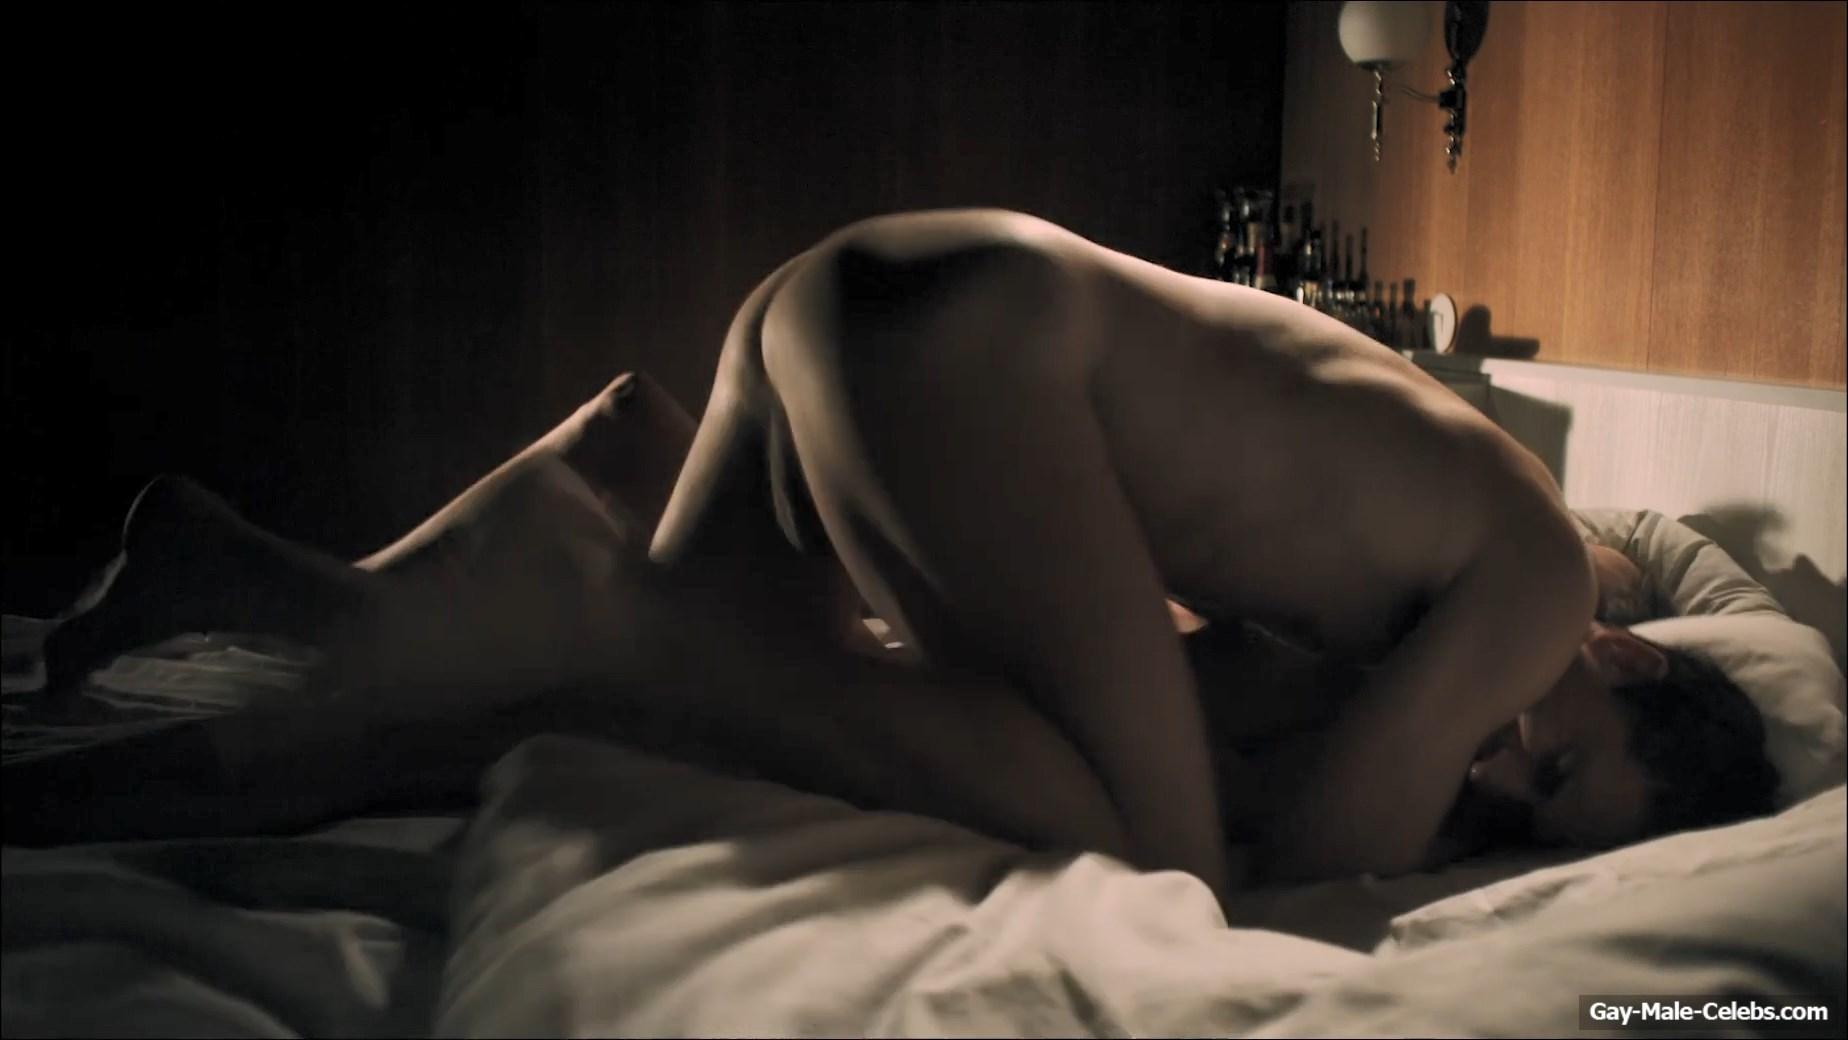 German Actor Oliver Mommsen Frontal Nude Movie Scenes -6501